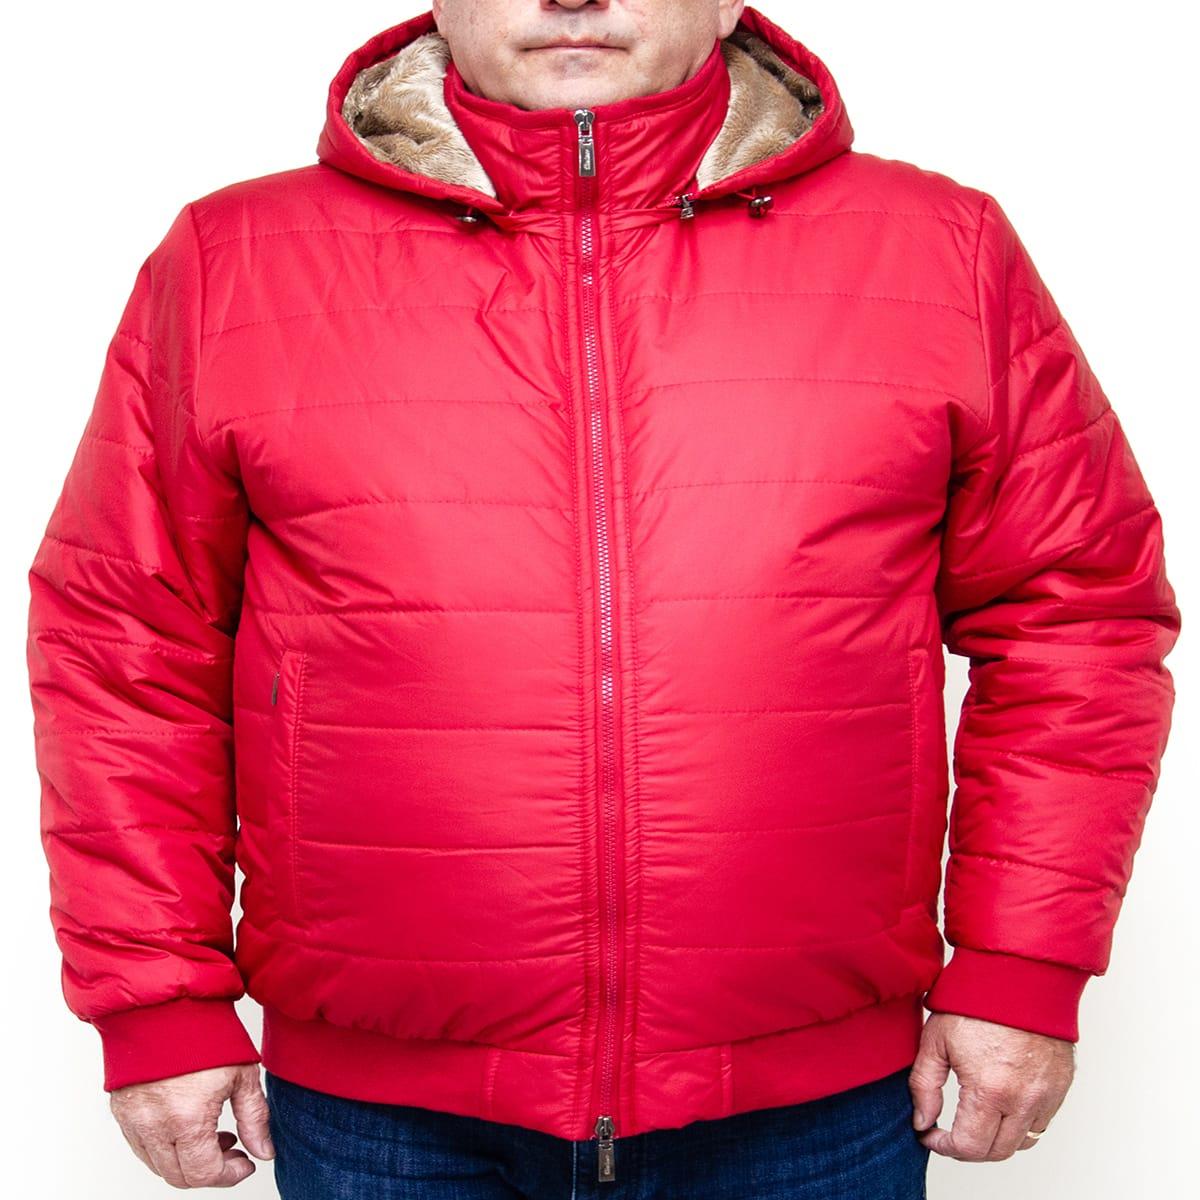 Geaca de iarna rosie cu gluga din fas , Marime 5XL - egato.ro